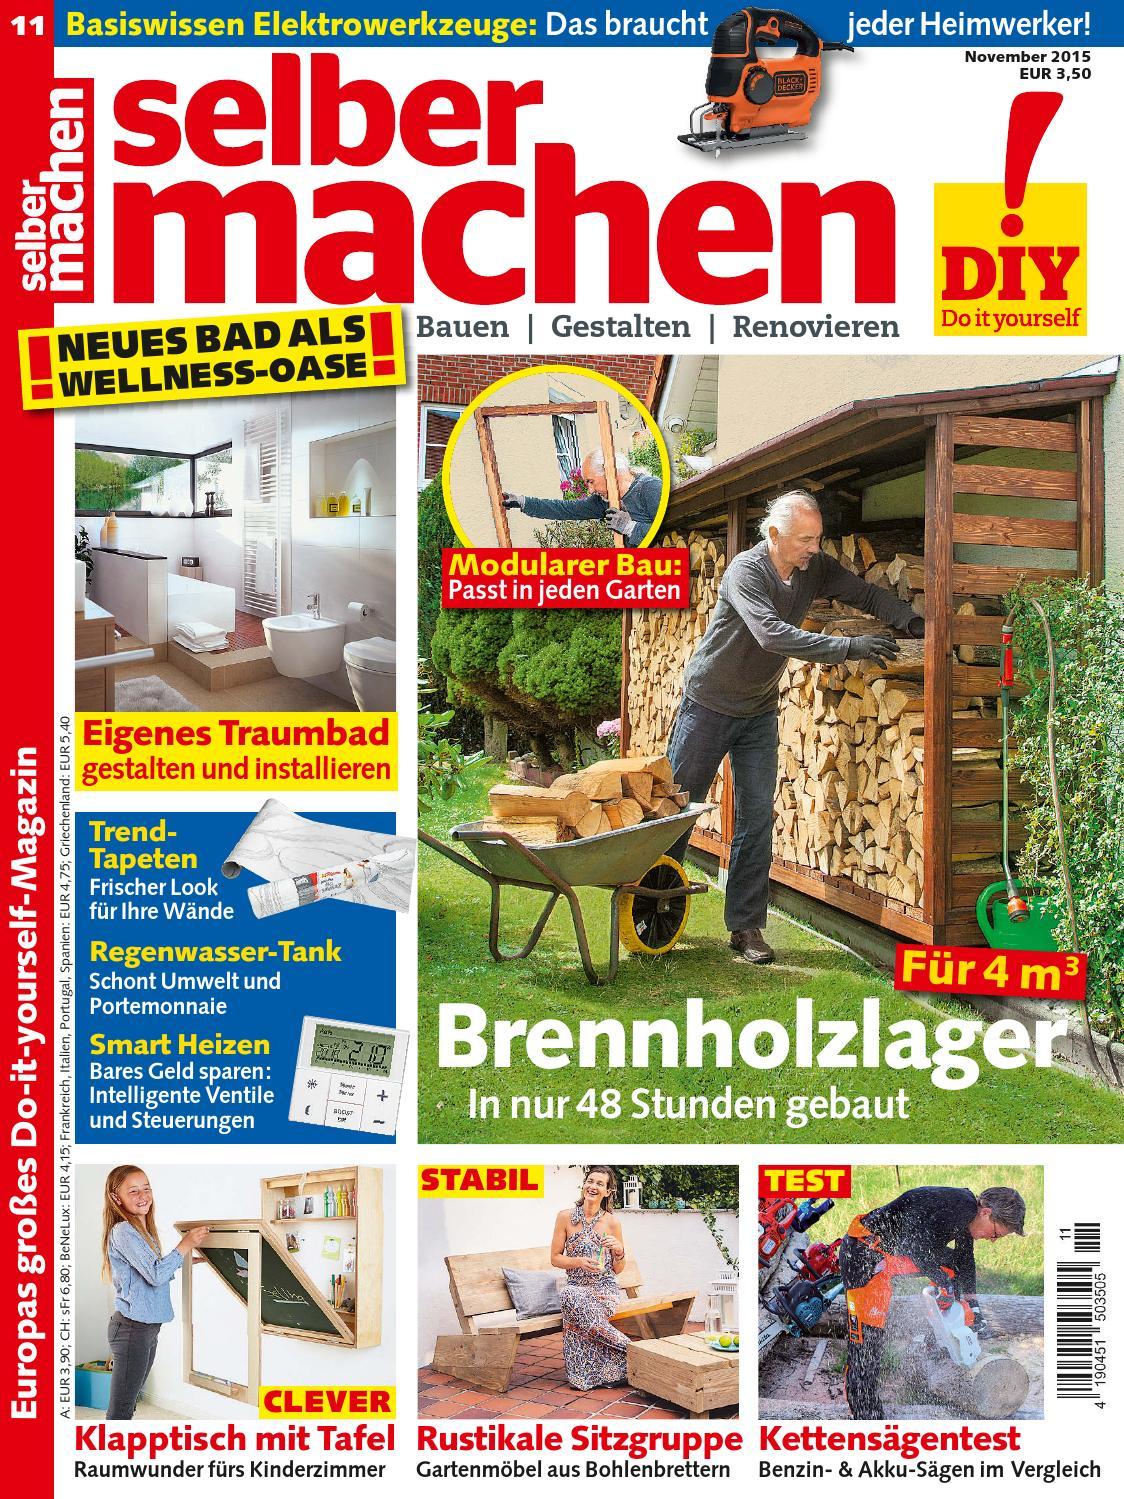 selber machen 2015 11 by b0mb3r issuu. Black Bedroom Furniture Sets. Home Design Ideas